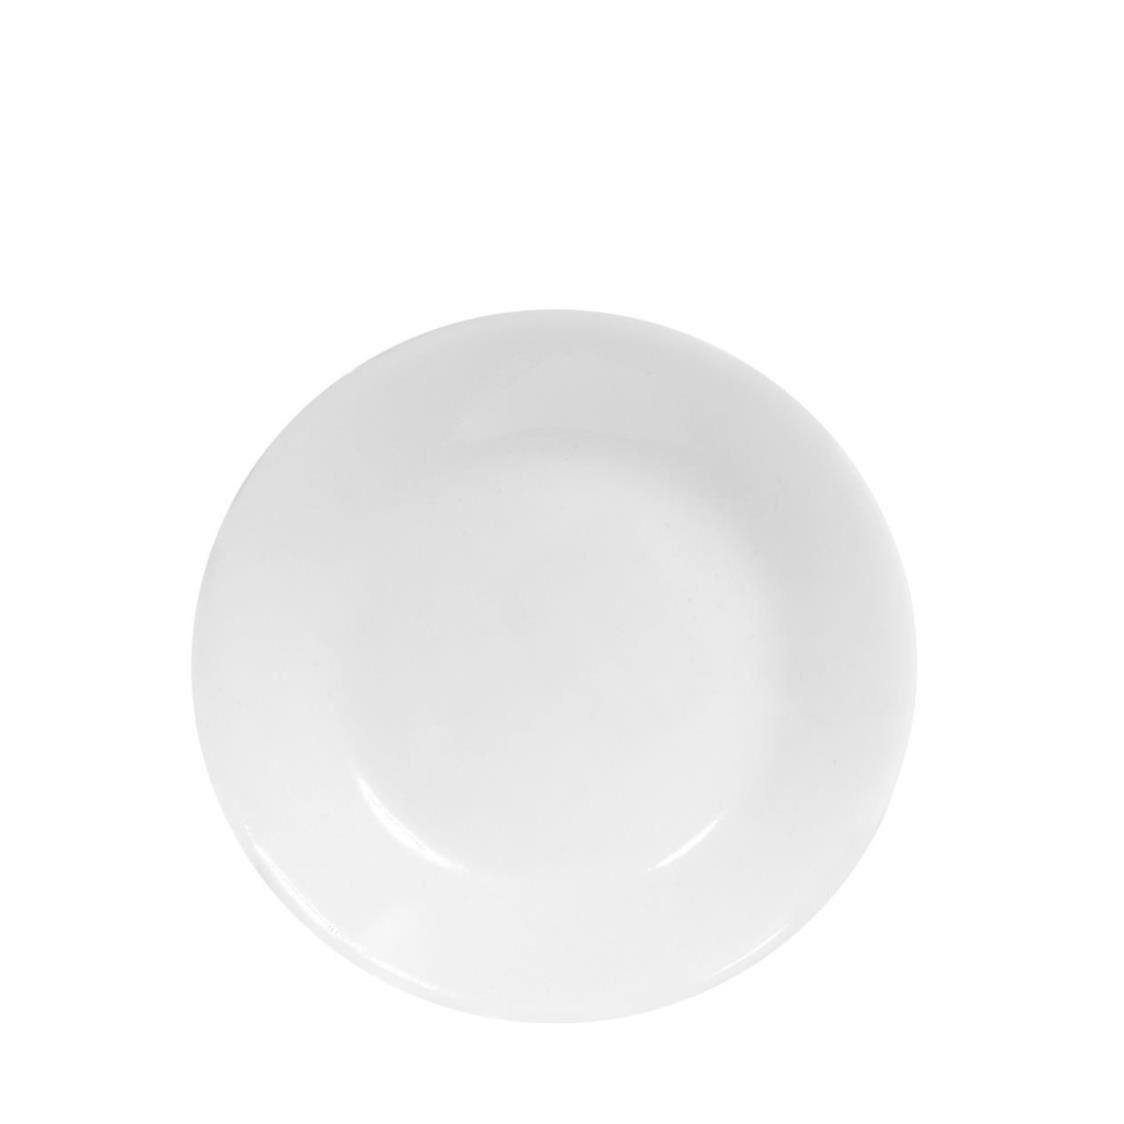 Corelle BreadButter Plate Winter Frost White